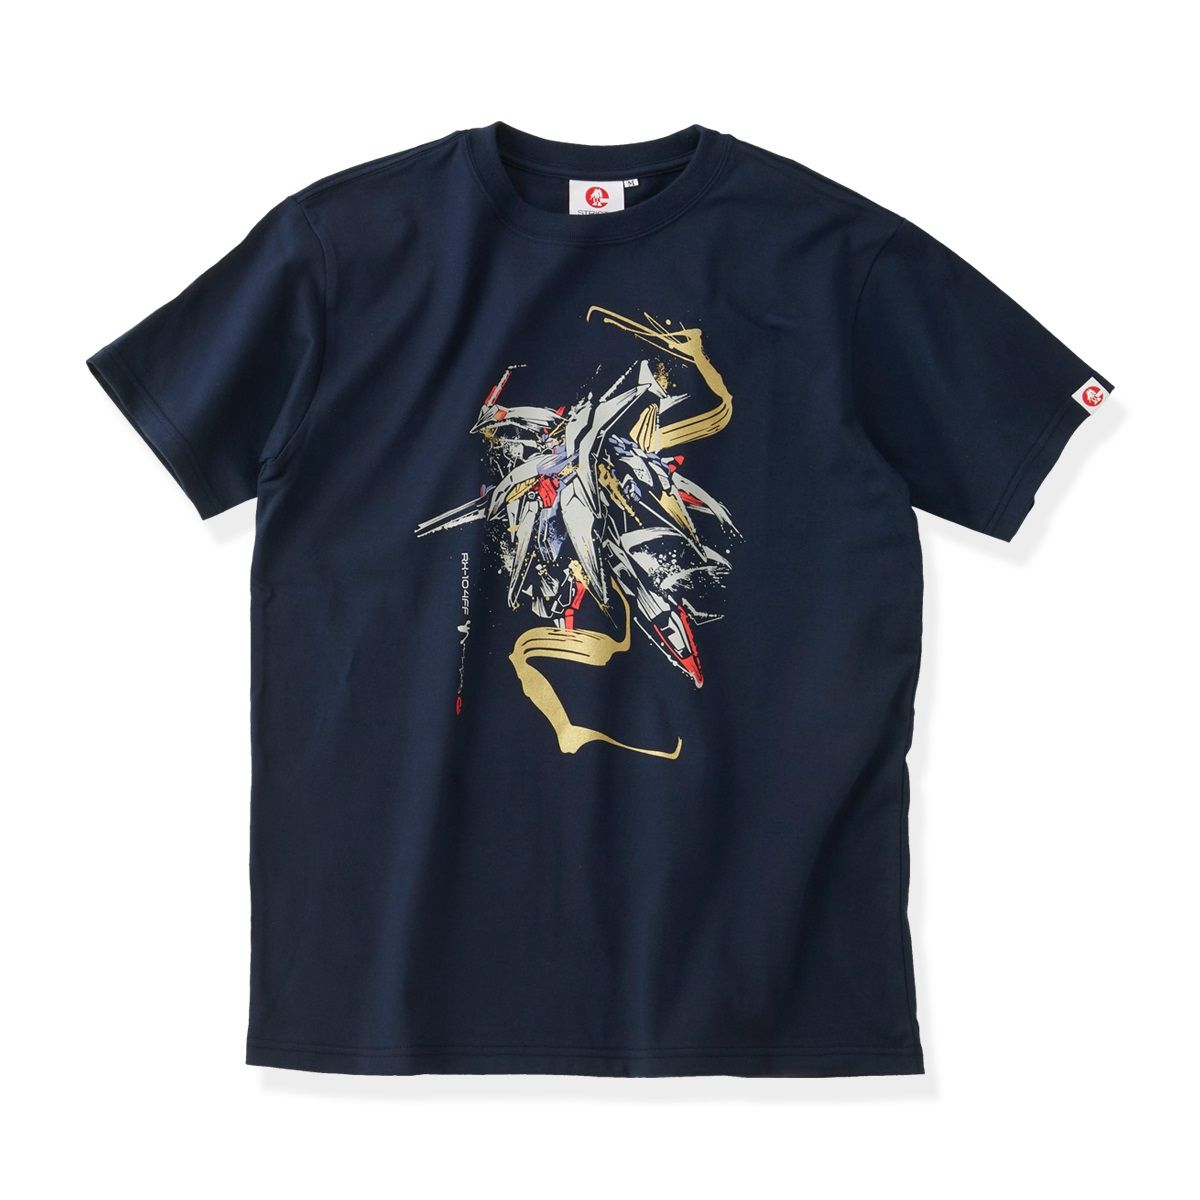 Penelope T-shirt—Mobile Suit Gundam Hathaway/STRICT-G JAPAN Collaboration